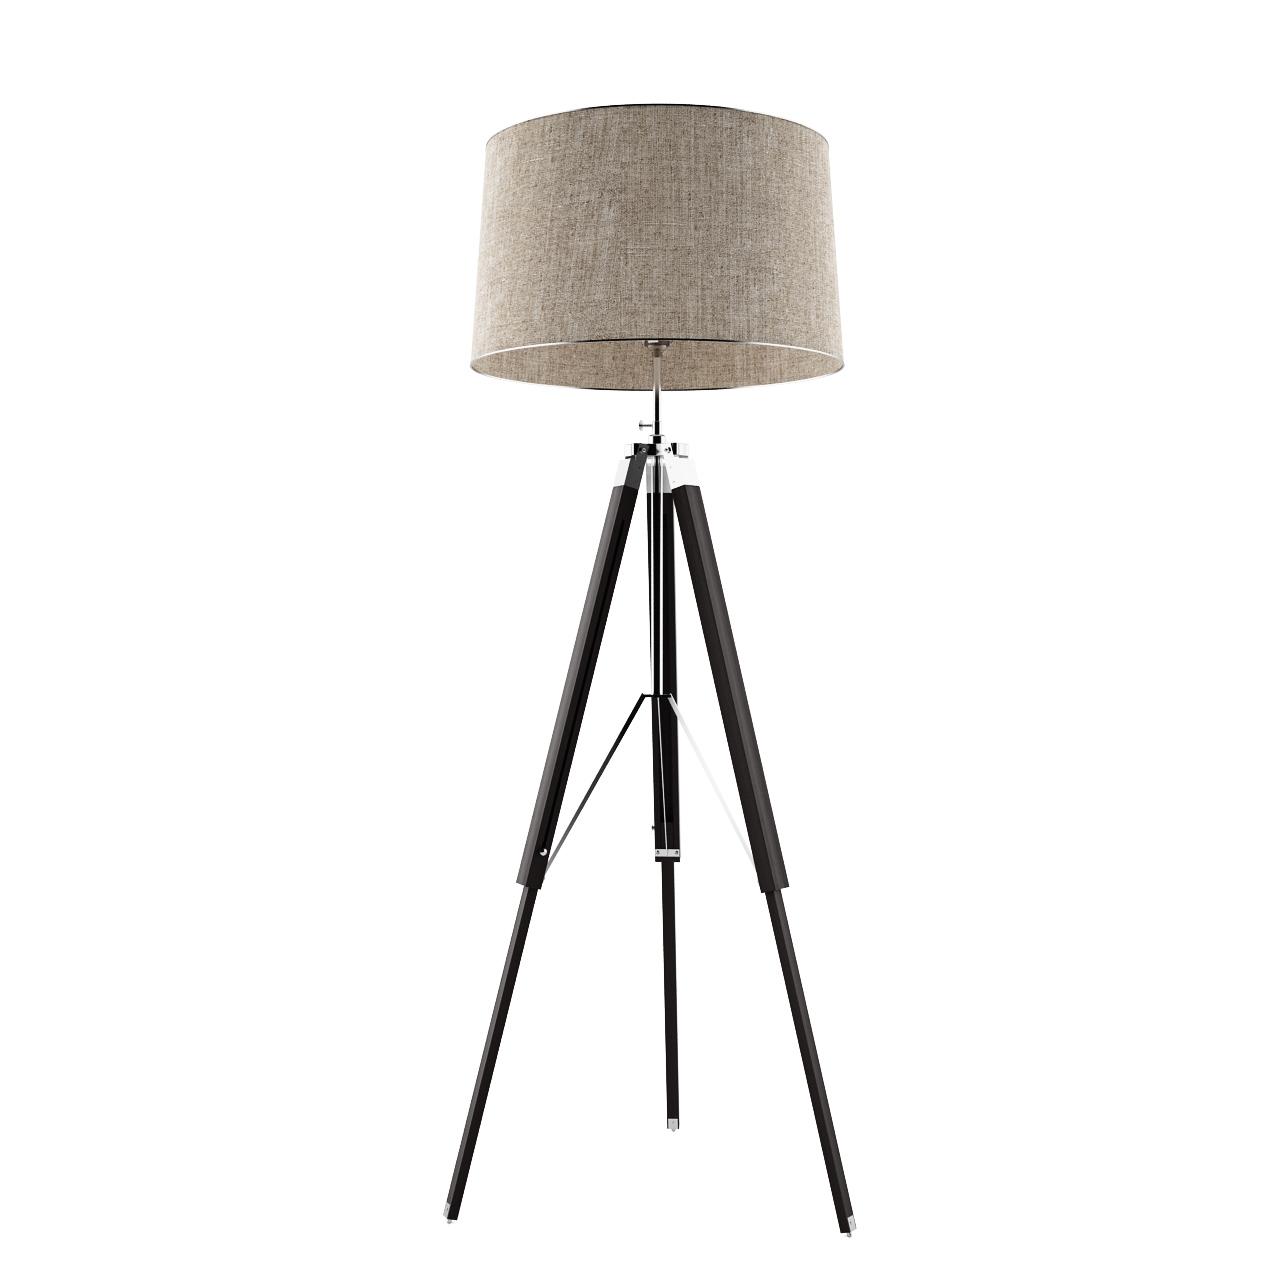 Tripod Lamp By Lombok Dimensiva